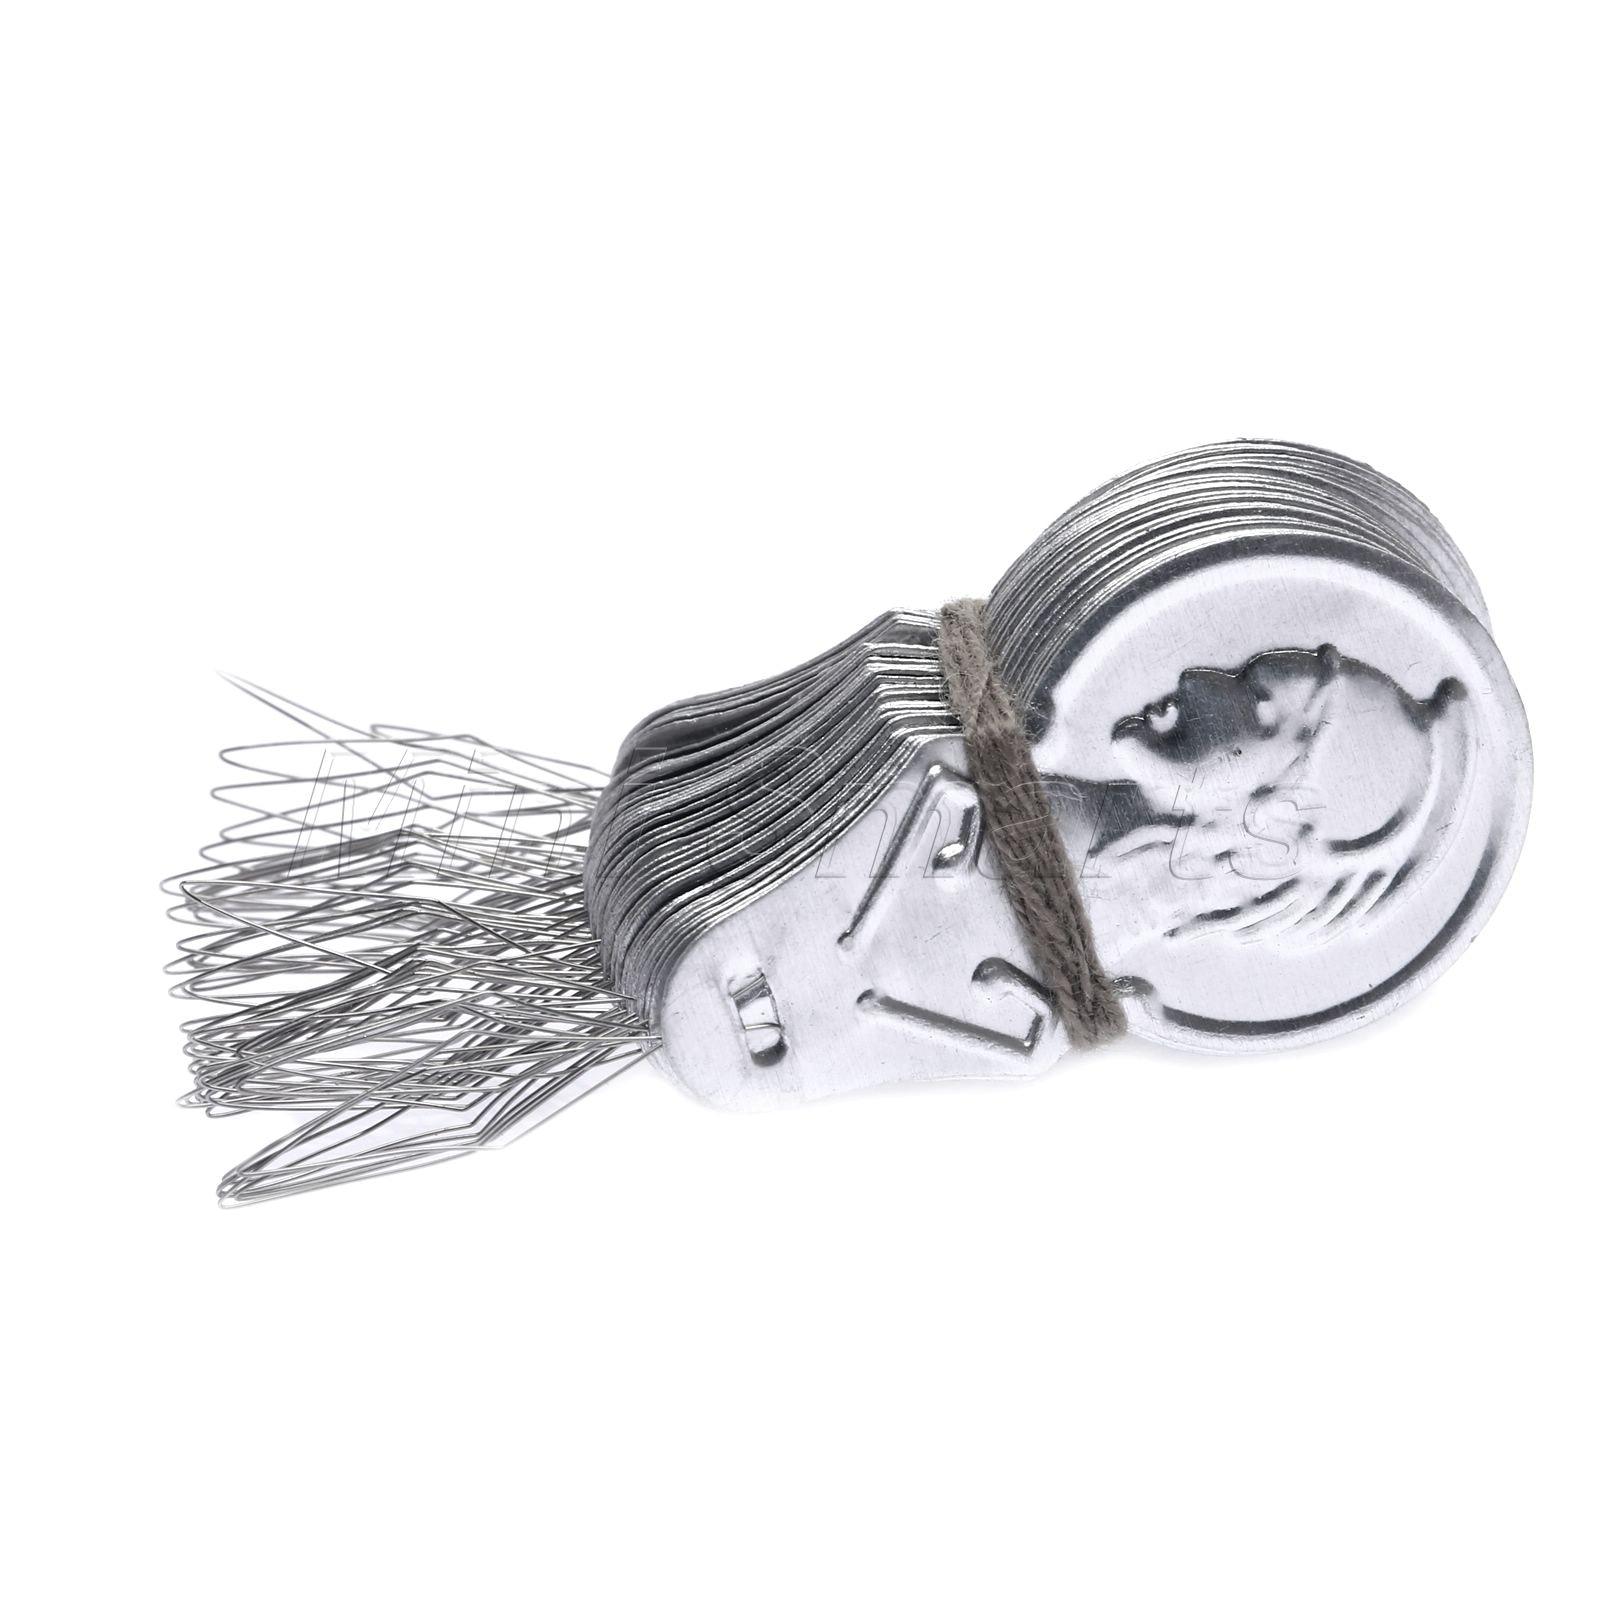 Bow Wire Needle Stitch Threader Insertion Craft Tool Ki Sewing Machine D9Q1 W1R4